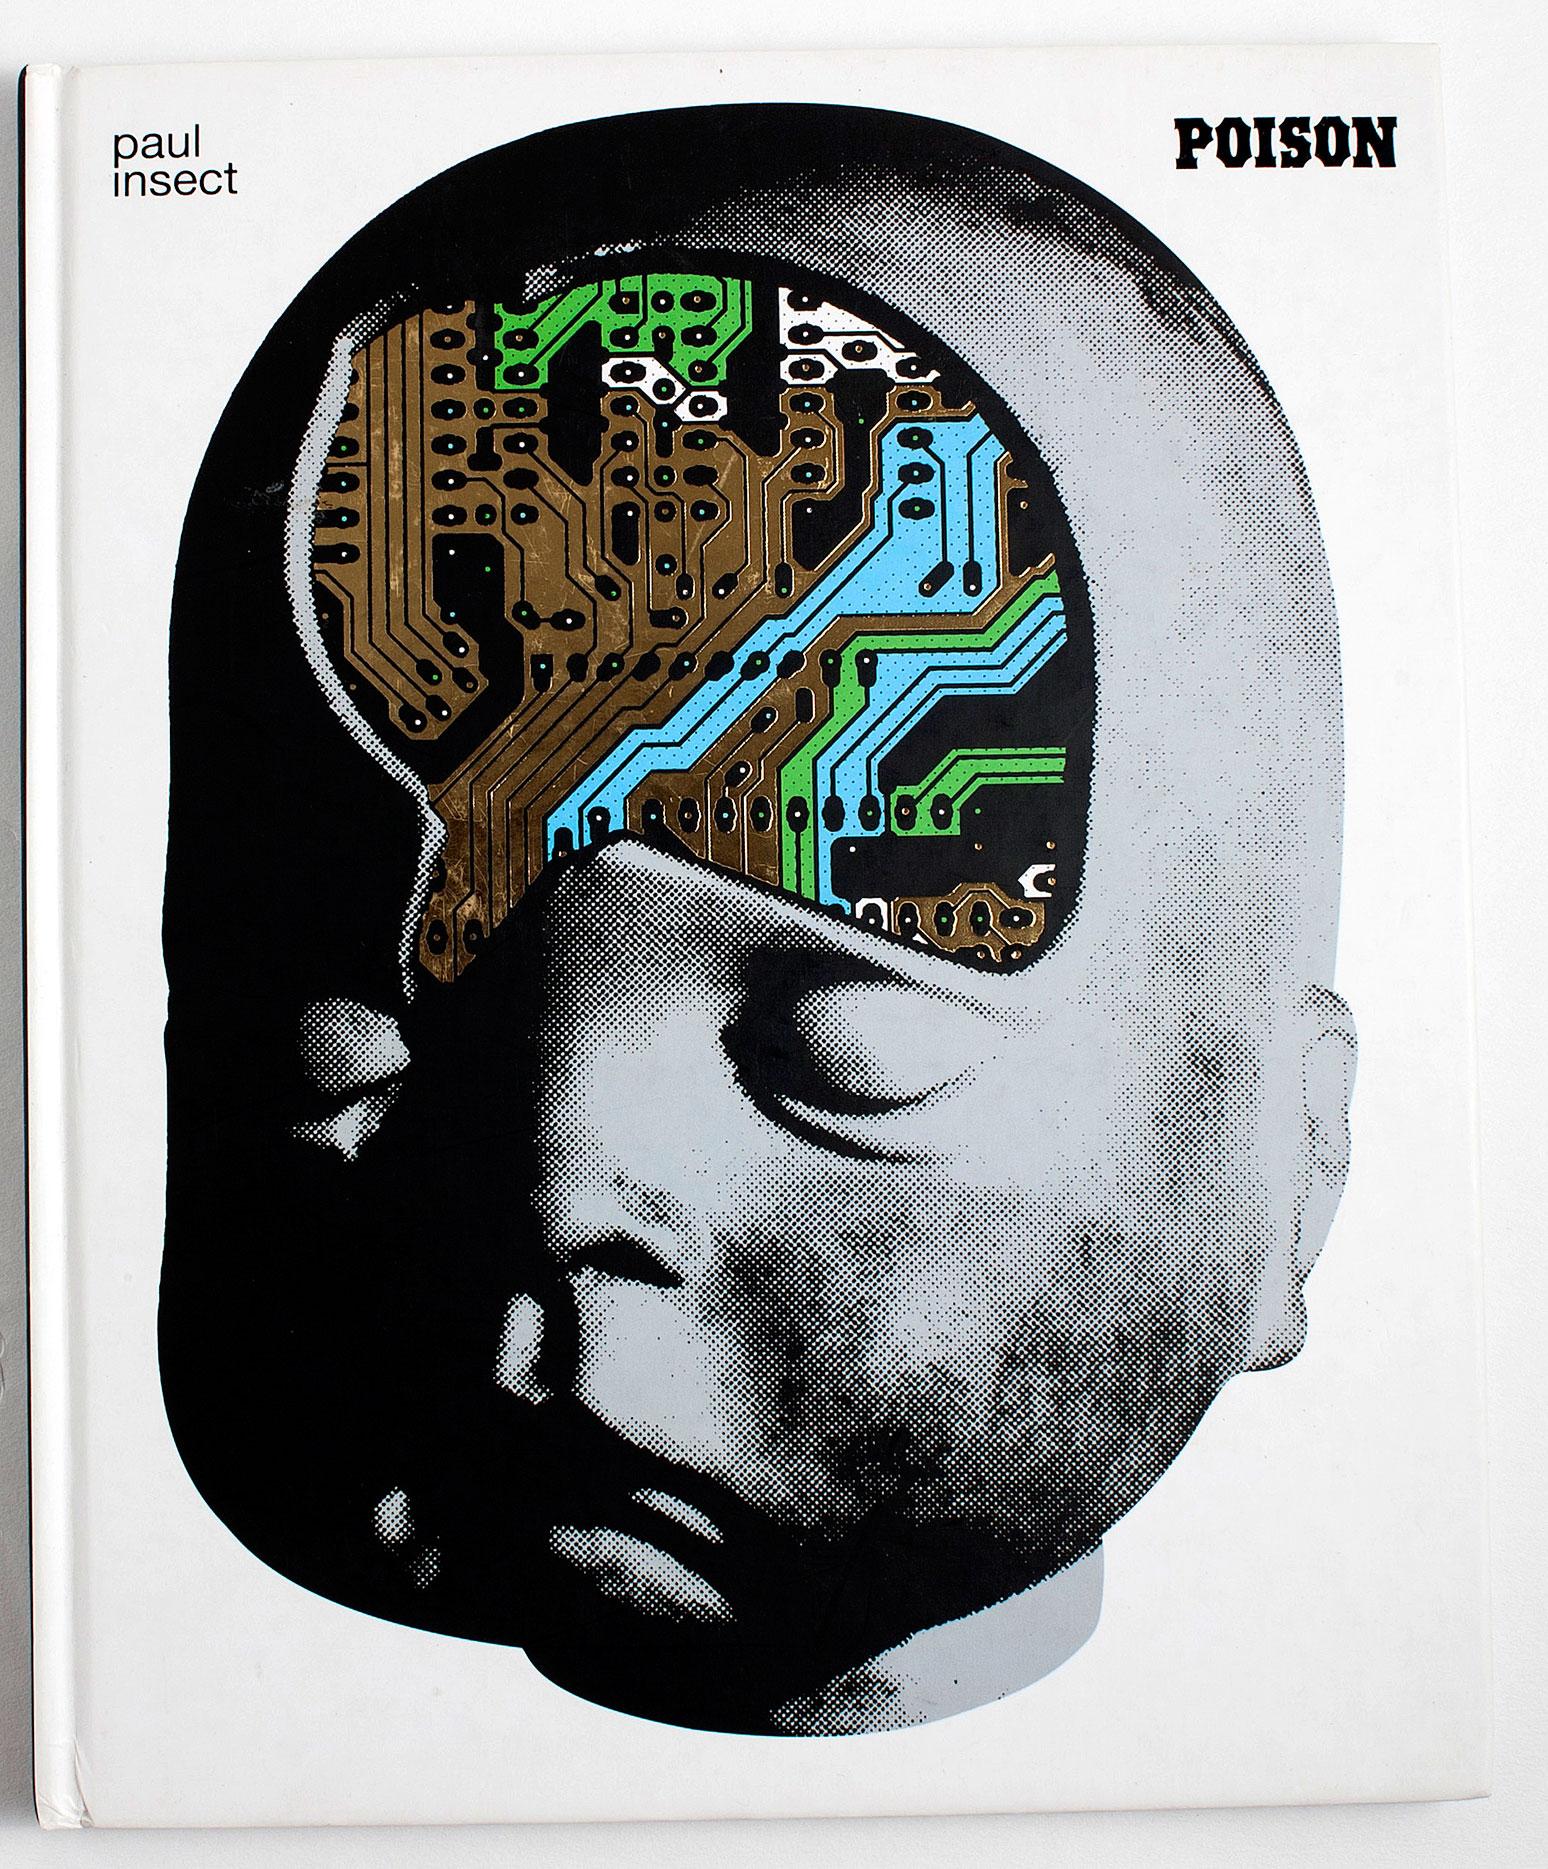 epm-print-management-art-books-paul-insect-2.jpg